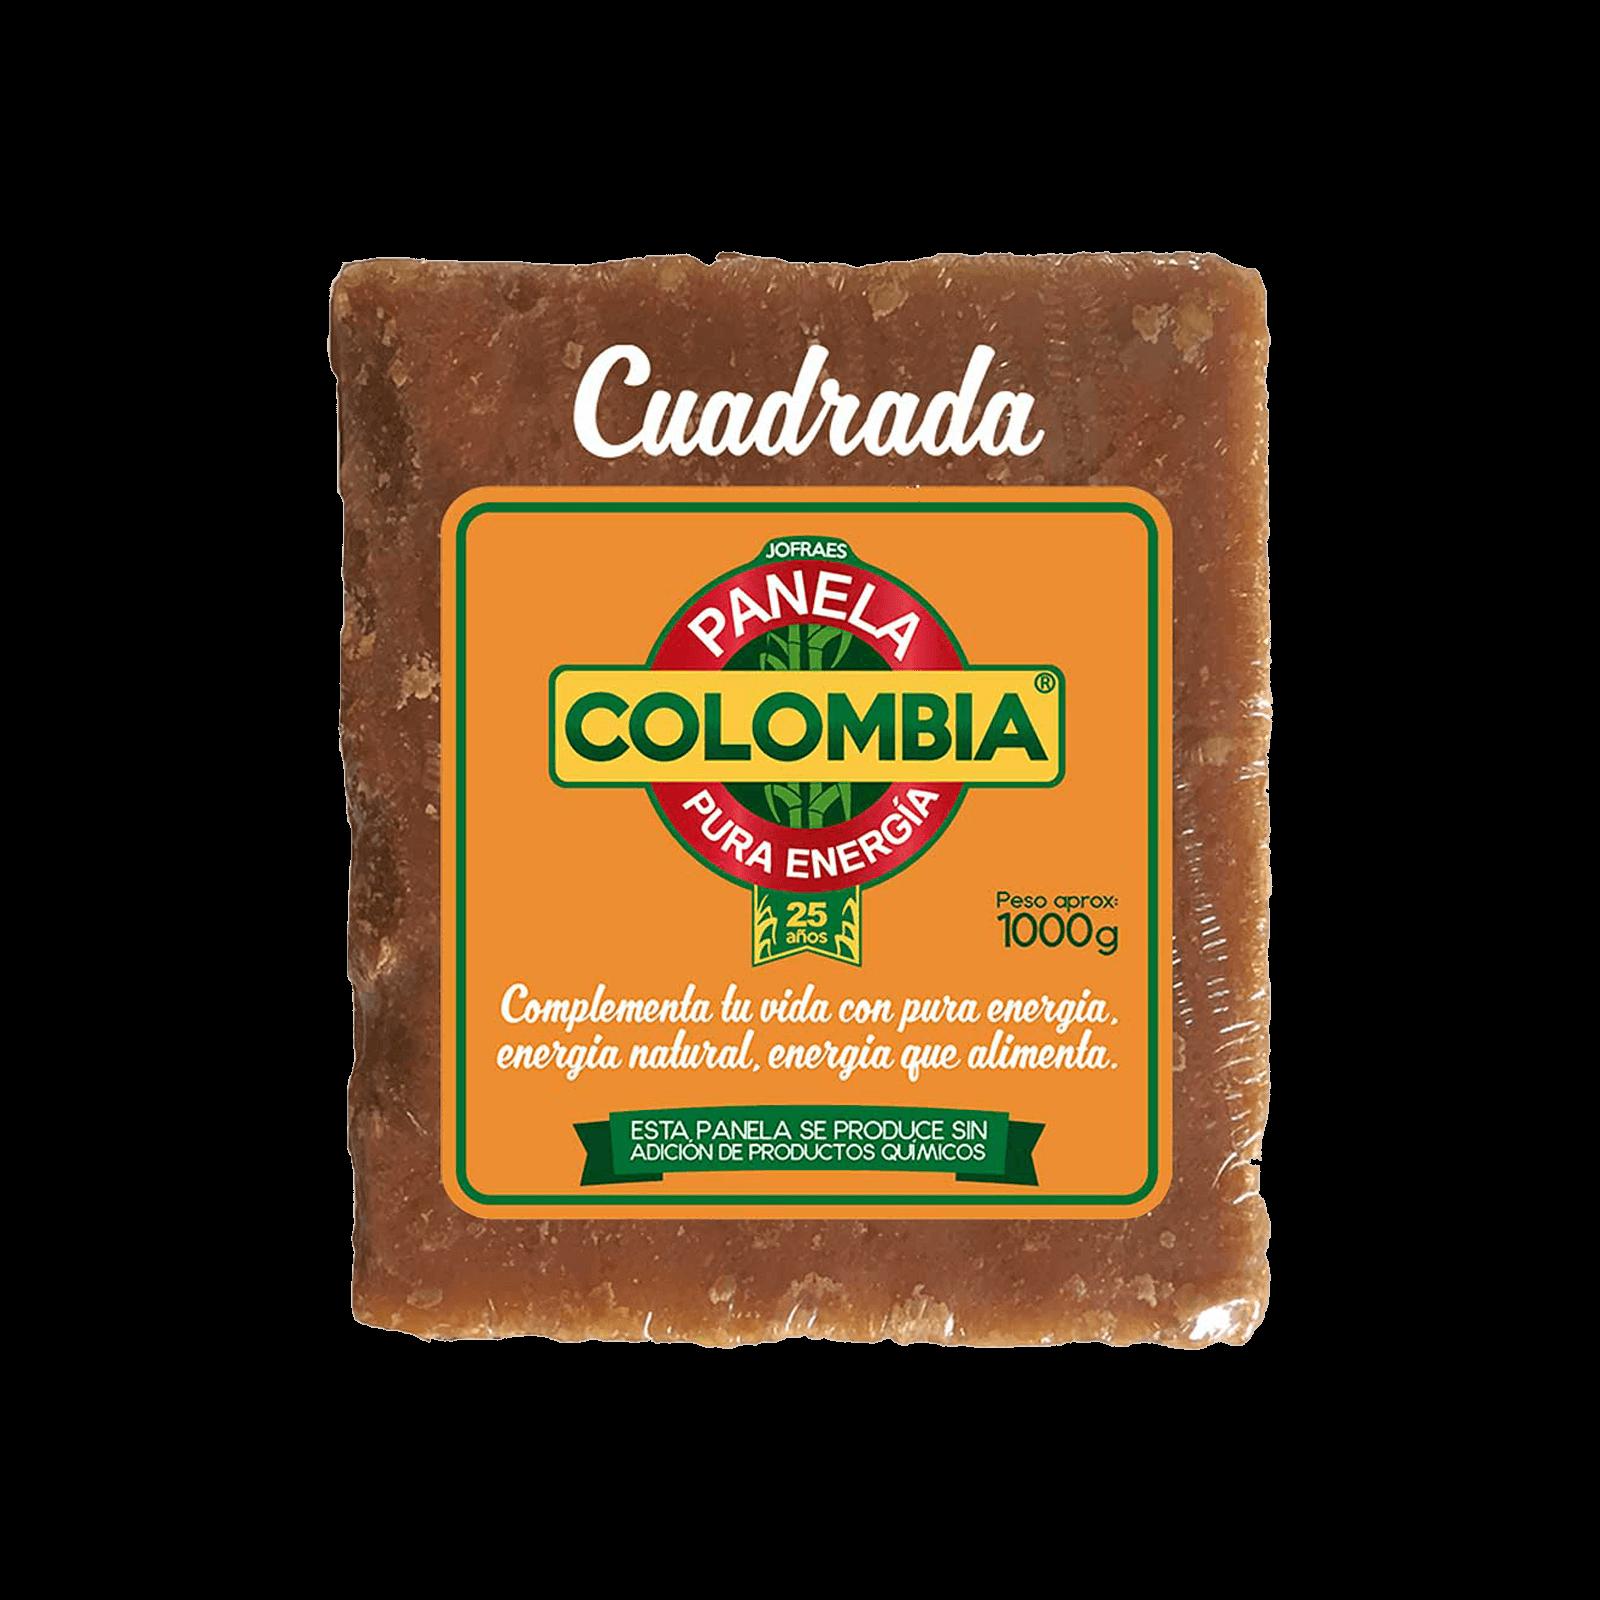 Panela Colombia Cuadrada